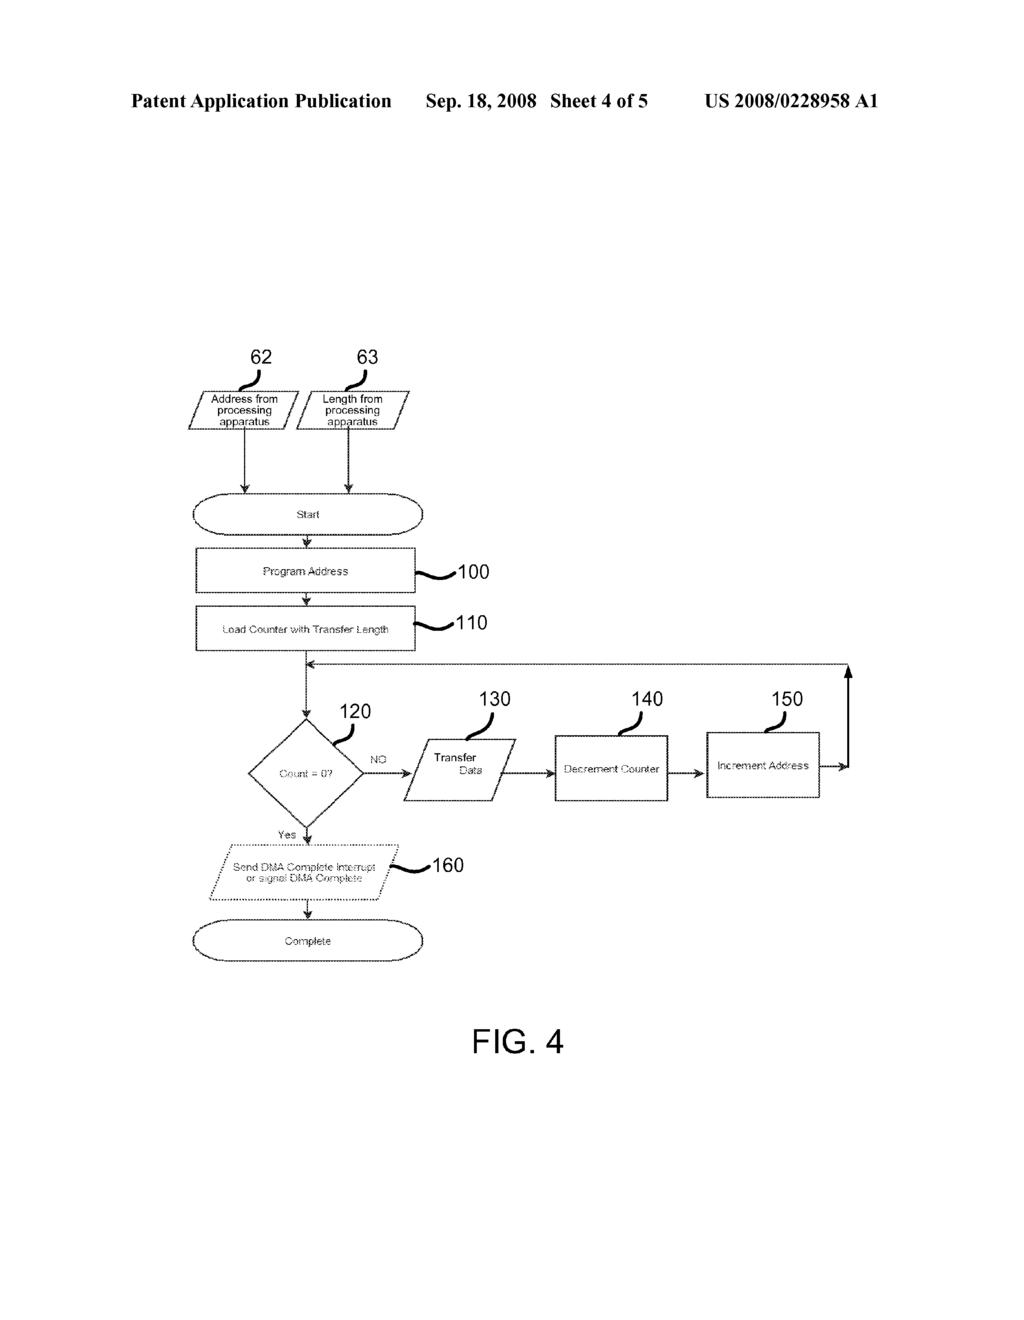 yamaha rd 350 wiring diagram diagrams single to 3 phase converter rd200 fzr750